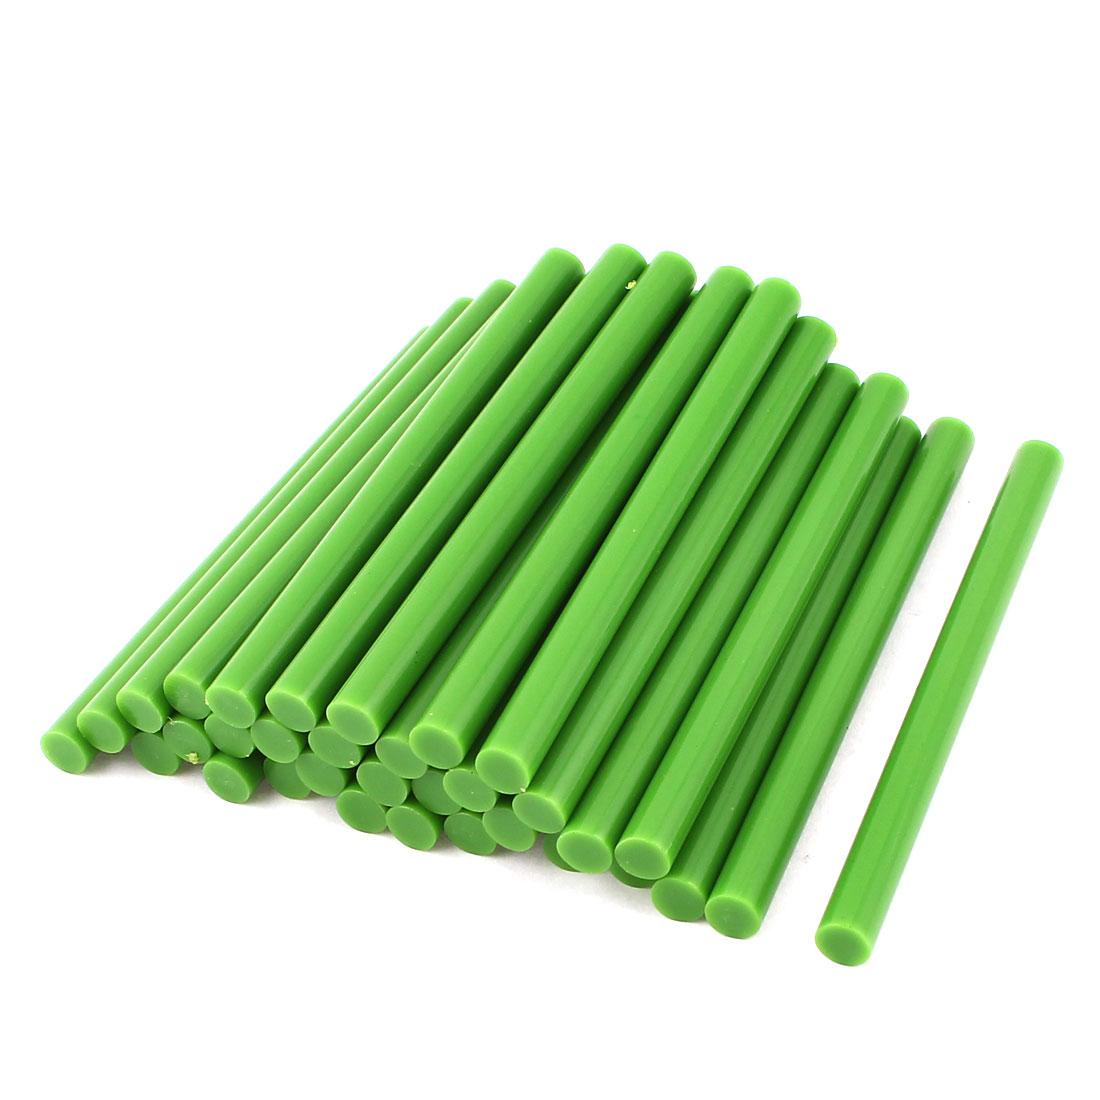 35 Pcs Green Hot Melt Glue Gun Adhesive Sticks 7mm x 100mm